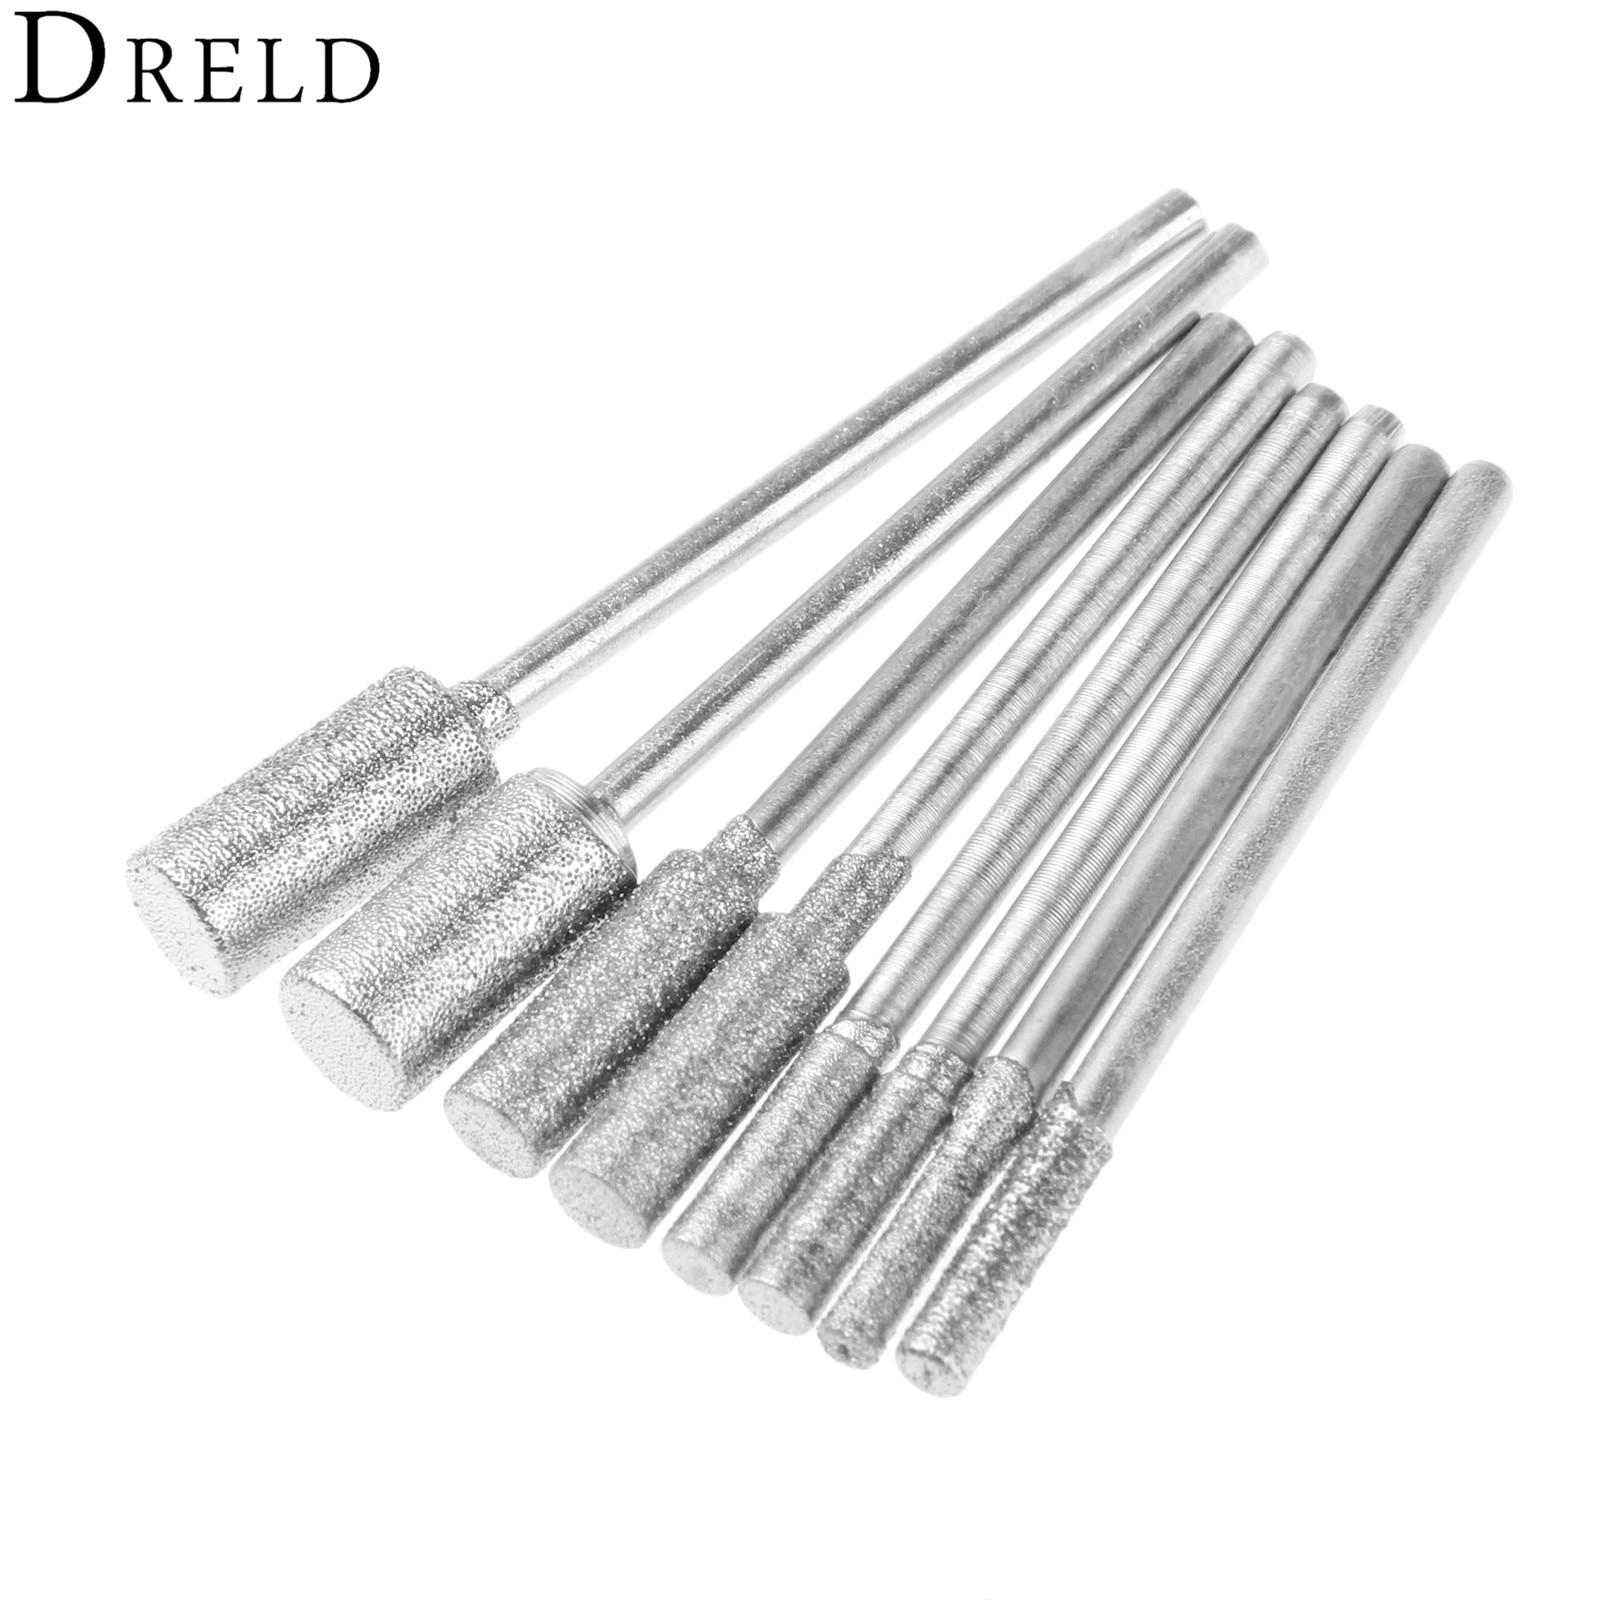 8pcs / set الماس برش سنگزنی نقاط نصب شده بیت 2.35mm ساقه سنگ یشم سنگ تراش پرداخت برای ابزار چرخشی Dremel